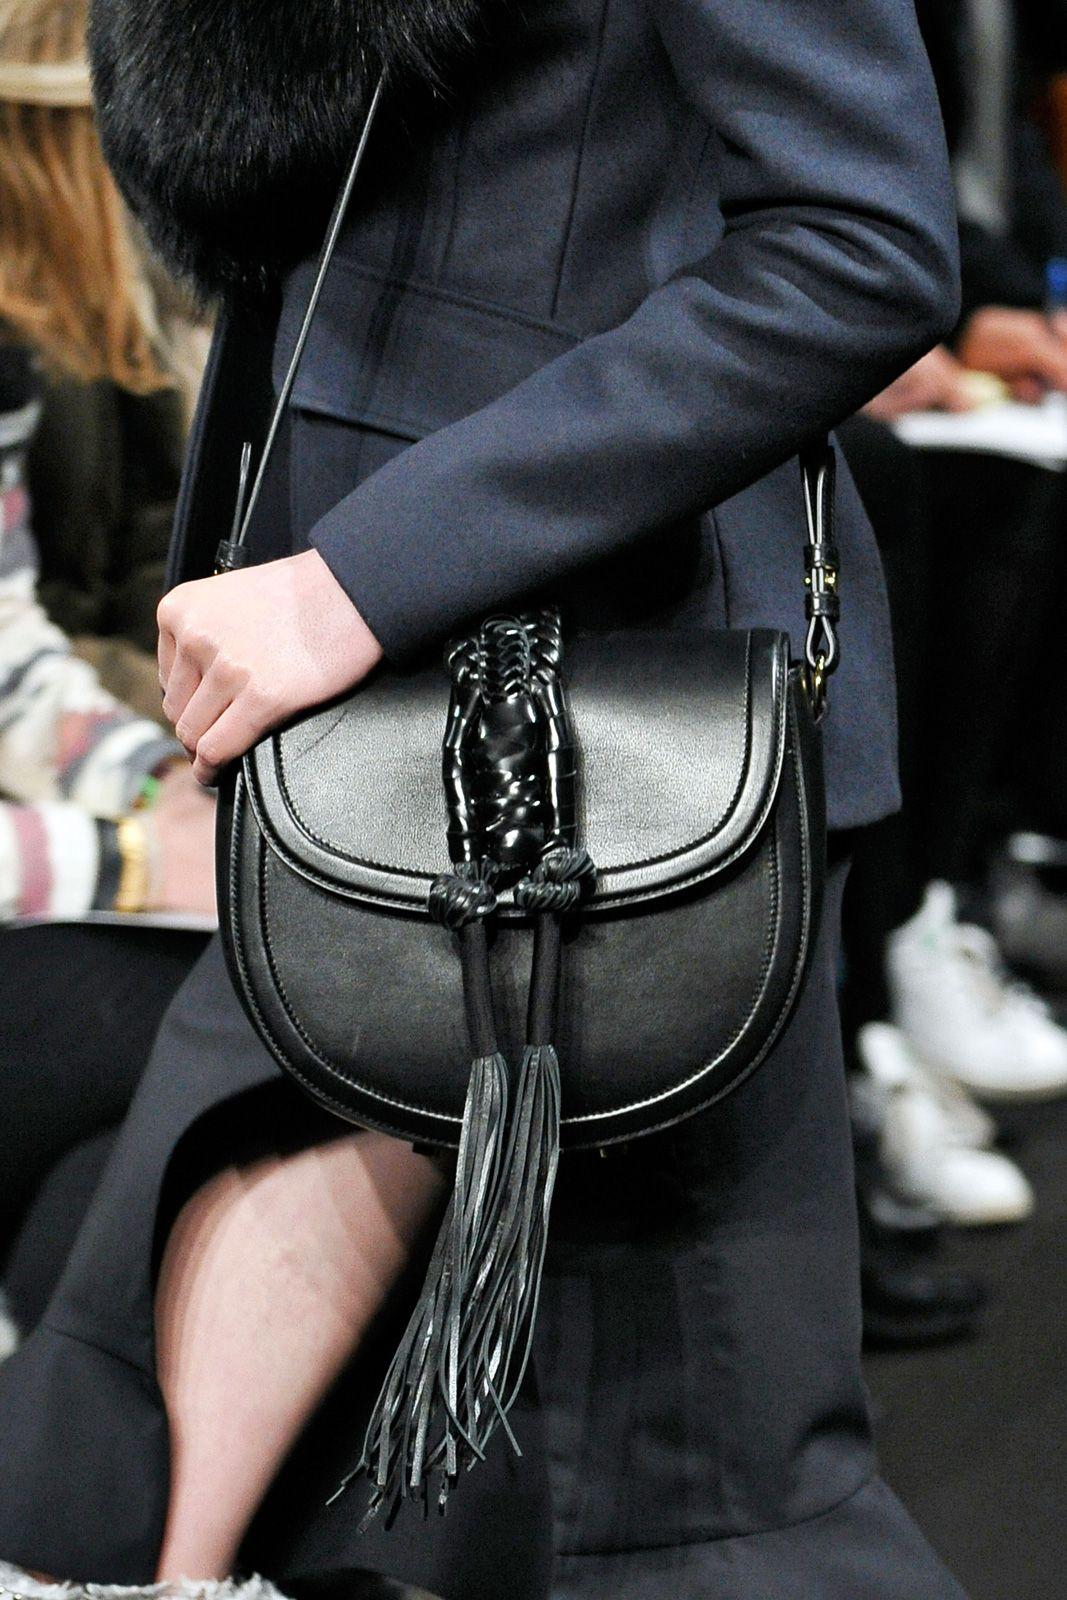 This Is Not A Drill: Altuzarra Has Debuted Handbags #refinery29 http://www.refinery29.com/2015/02/82336/altuzarra-bags-ny-fashion-week-2015#slide-1